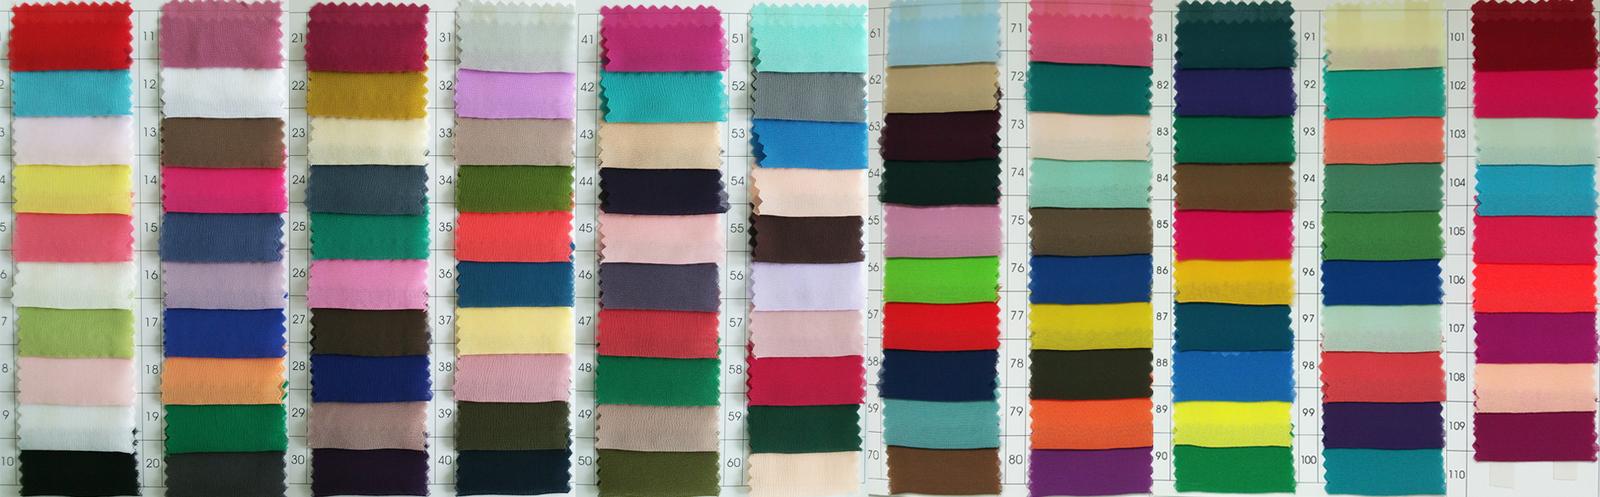 Silkychiffoncolor